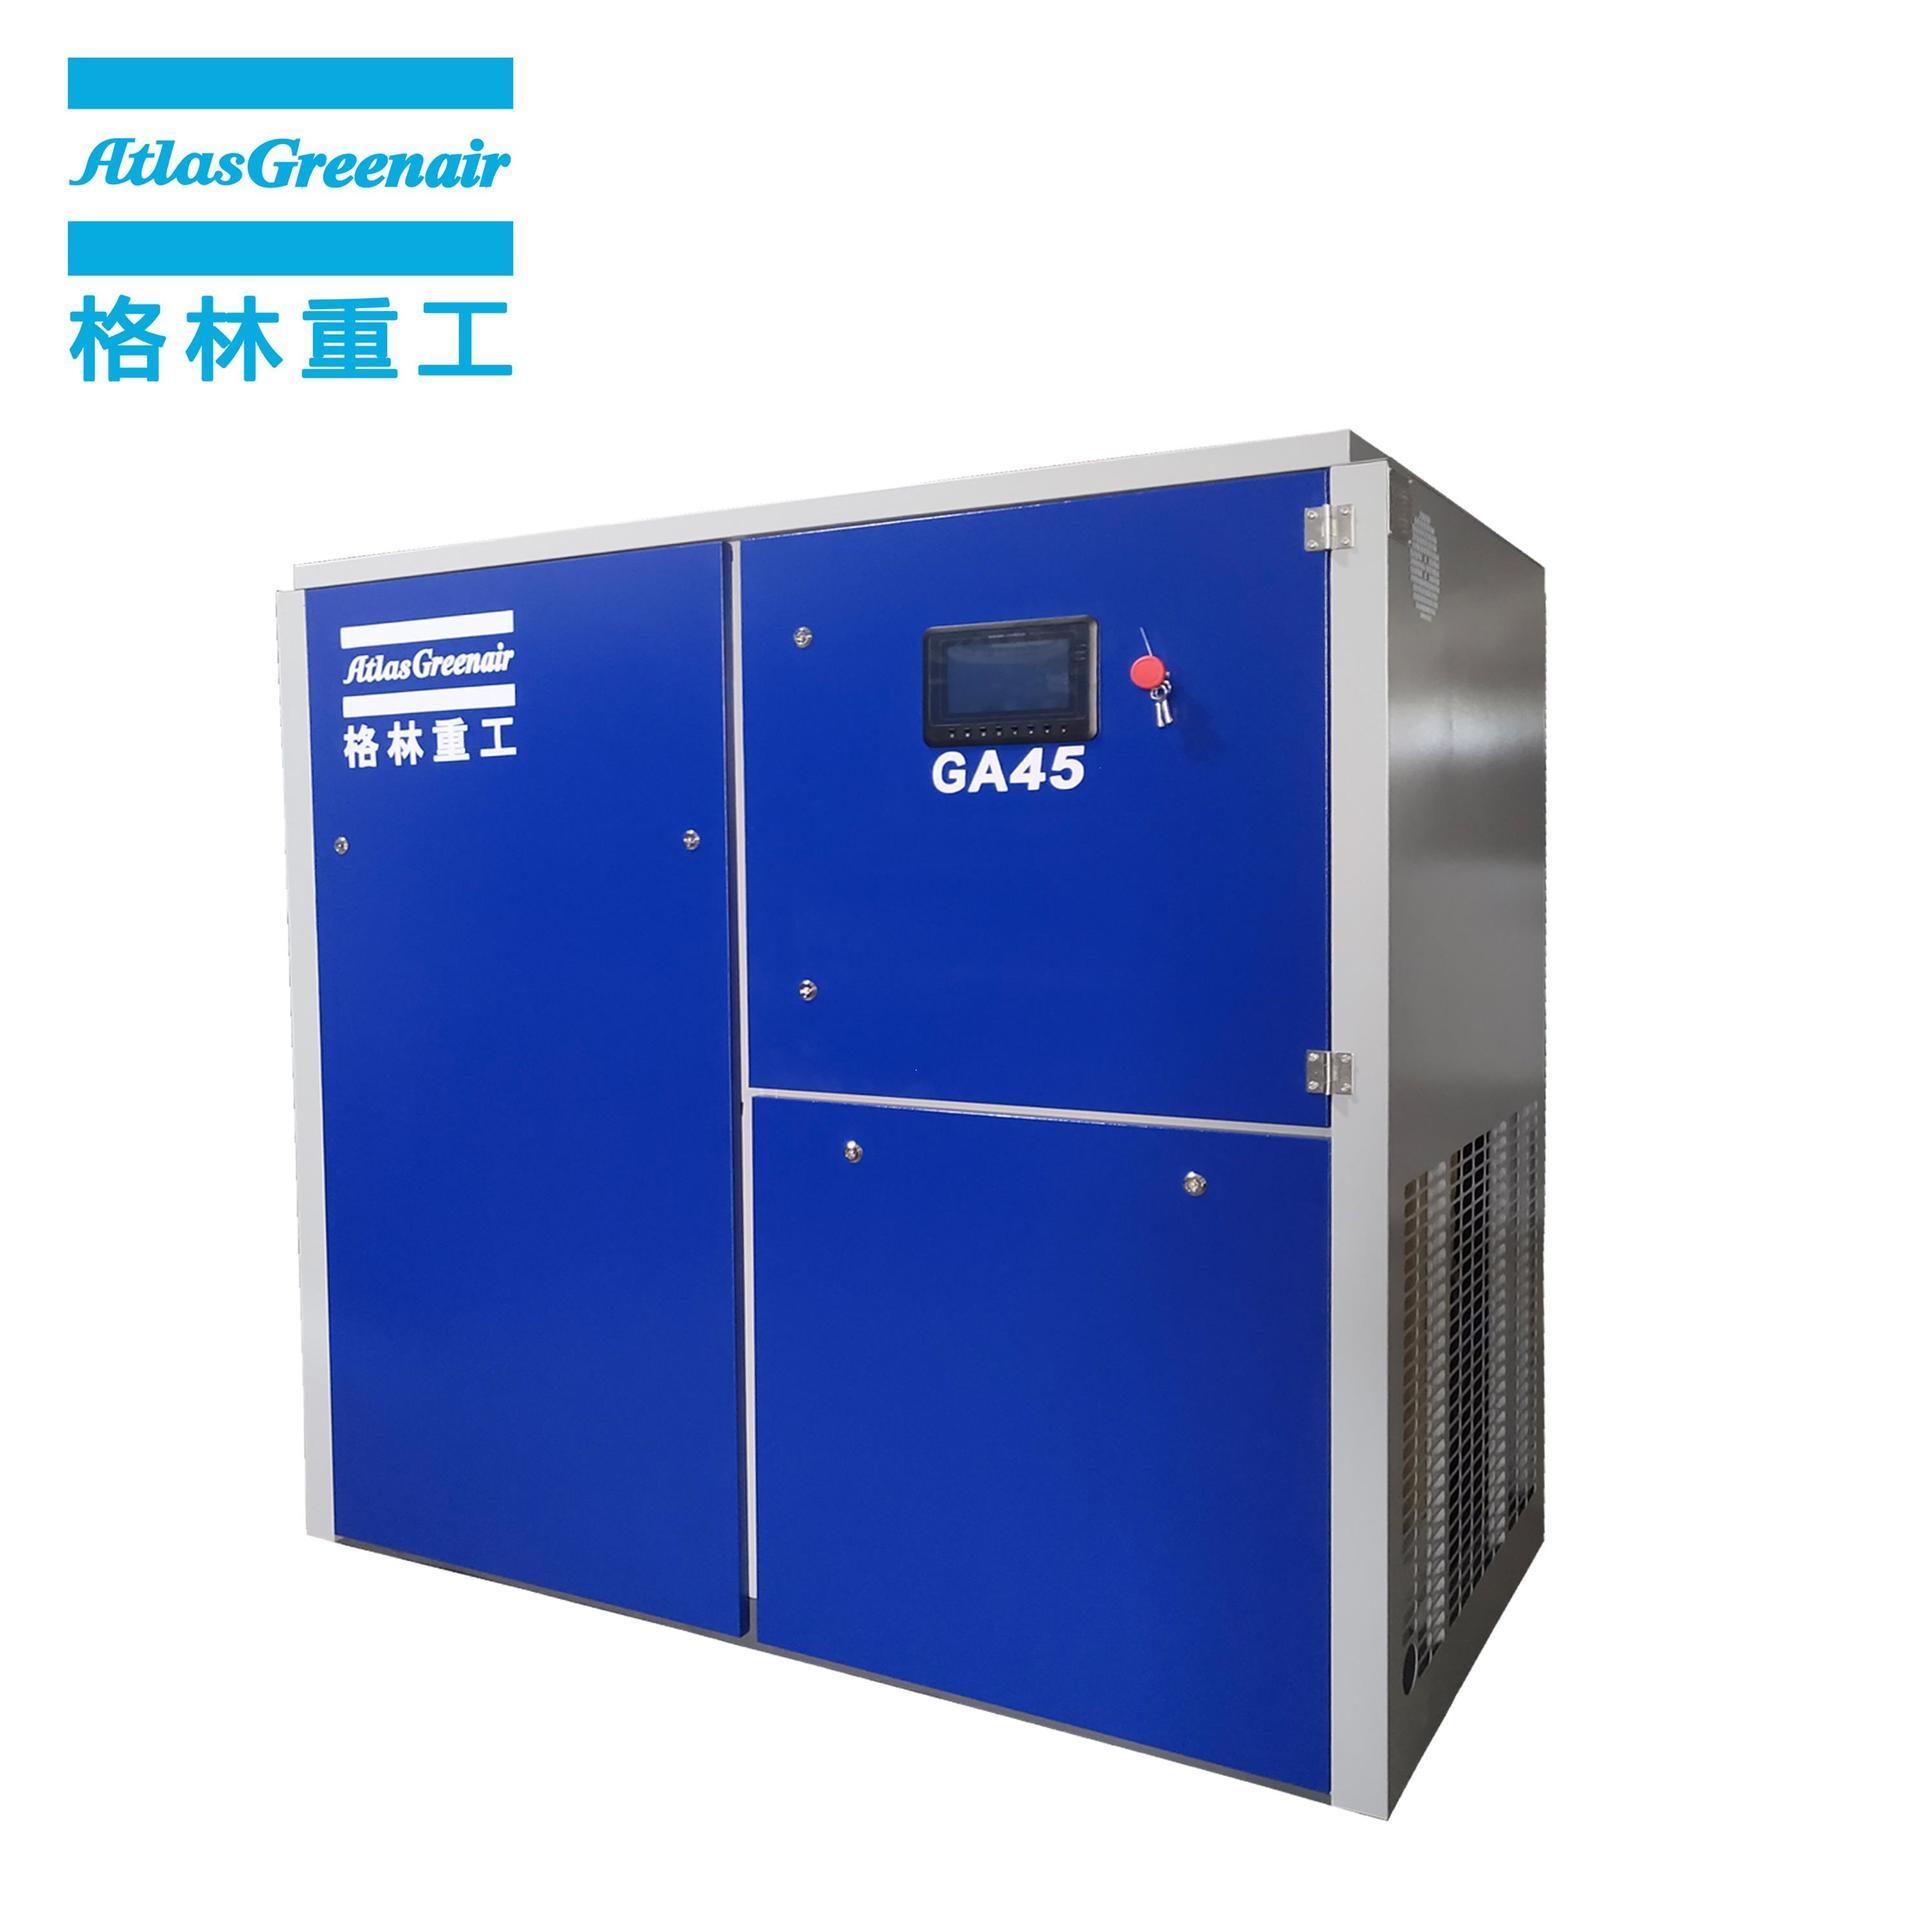 Atlas Greenair GA45 45KW 60HP Oil Injected Industrial Screw Air Compressor